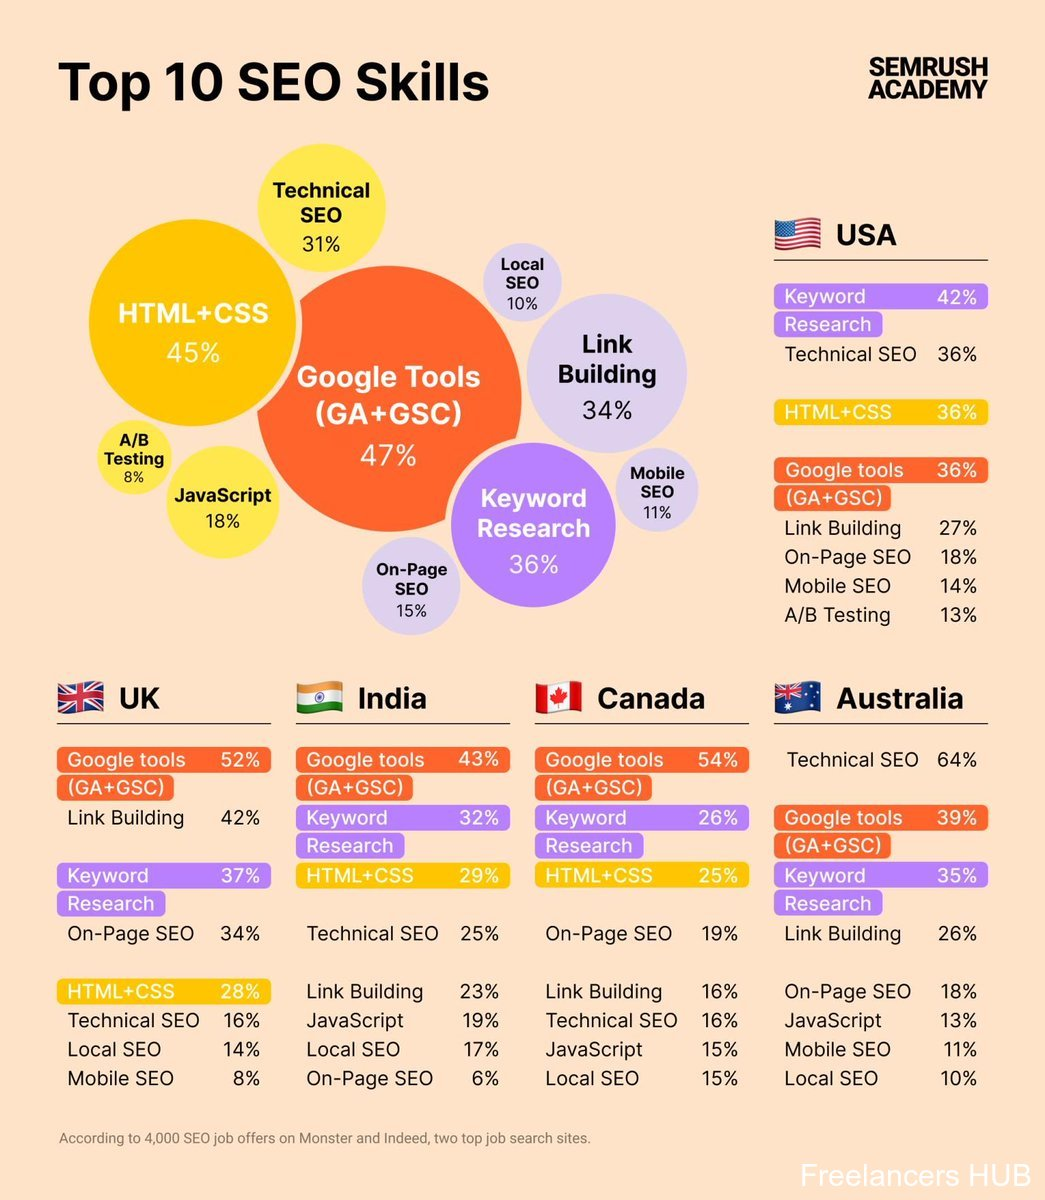 Top 10 #SEO skills